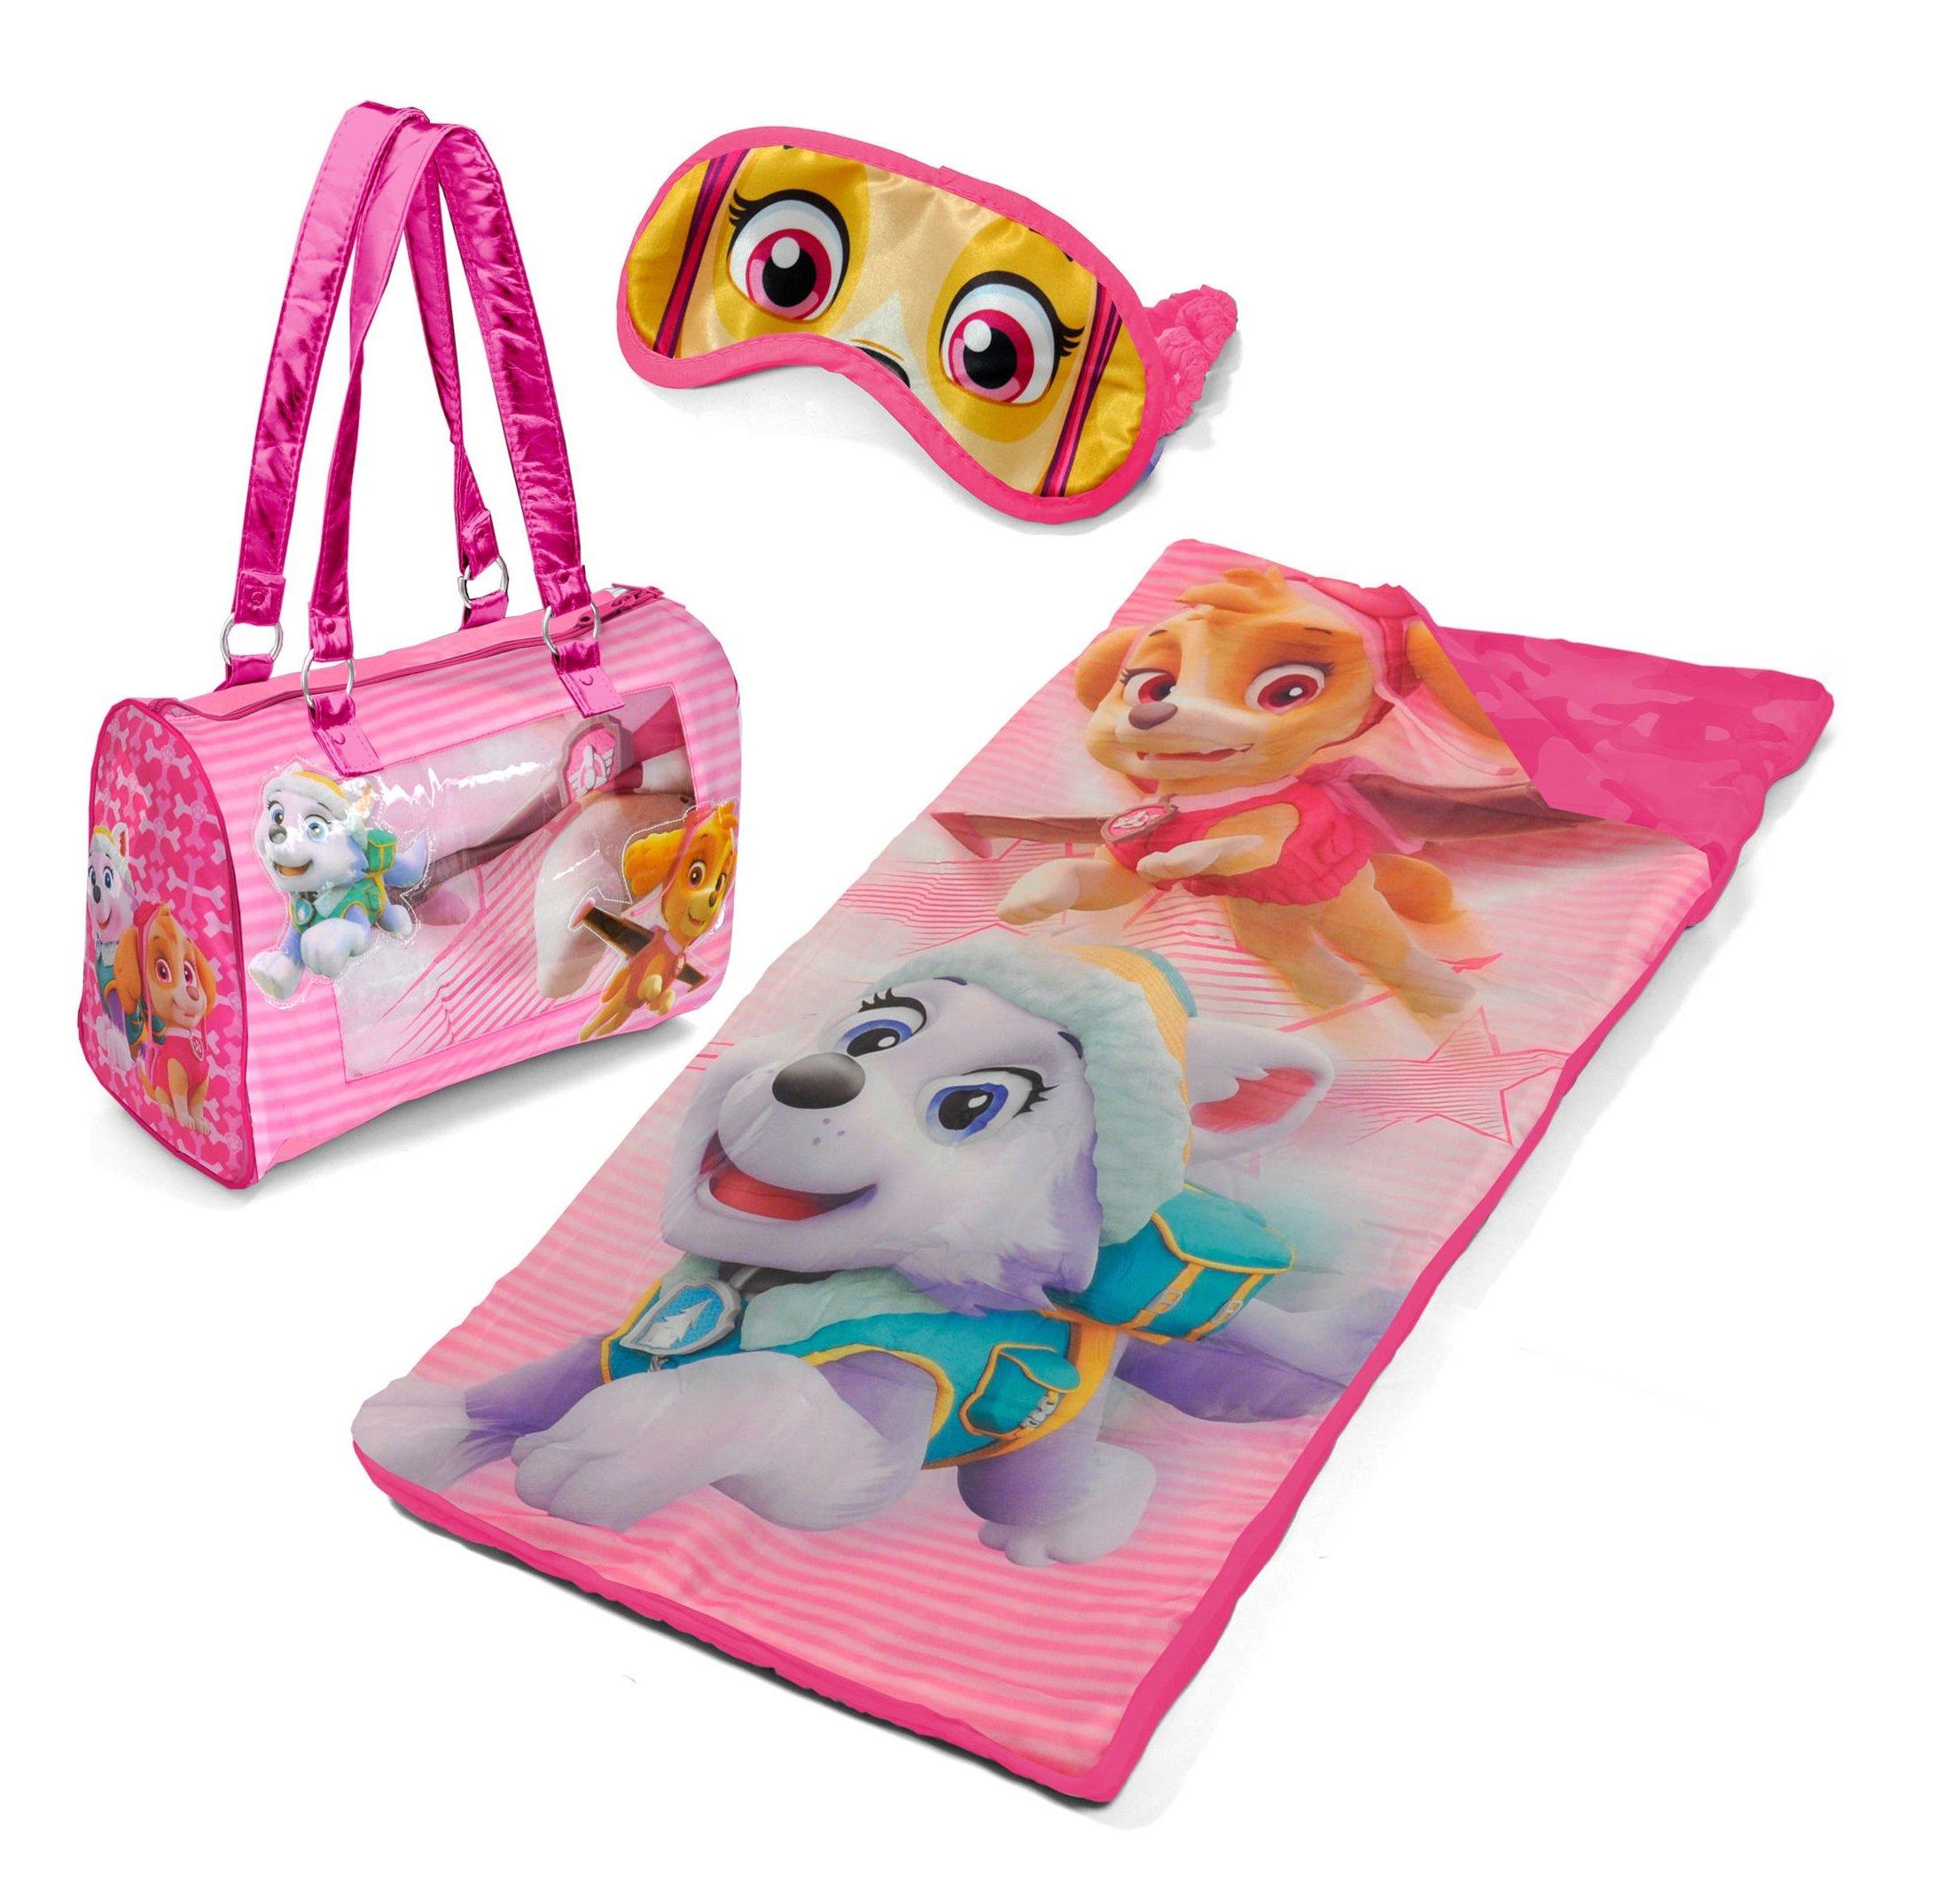 Paw Patrol Girls Sleepover Slumber Set with Sleeping Bag, Eye Mask and Carry Purse